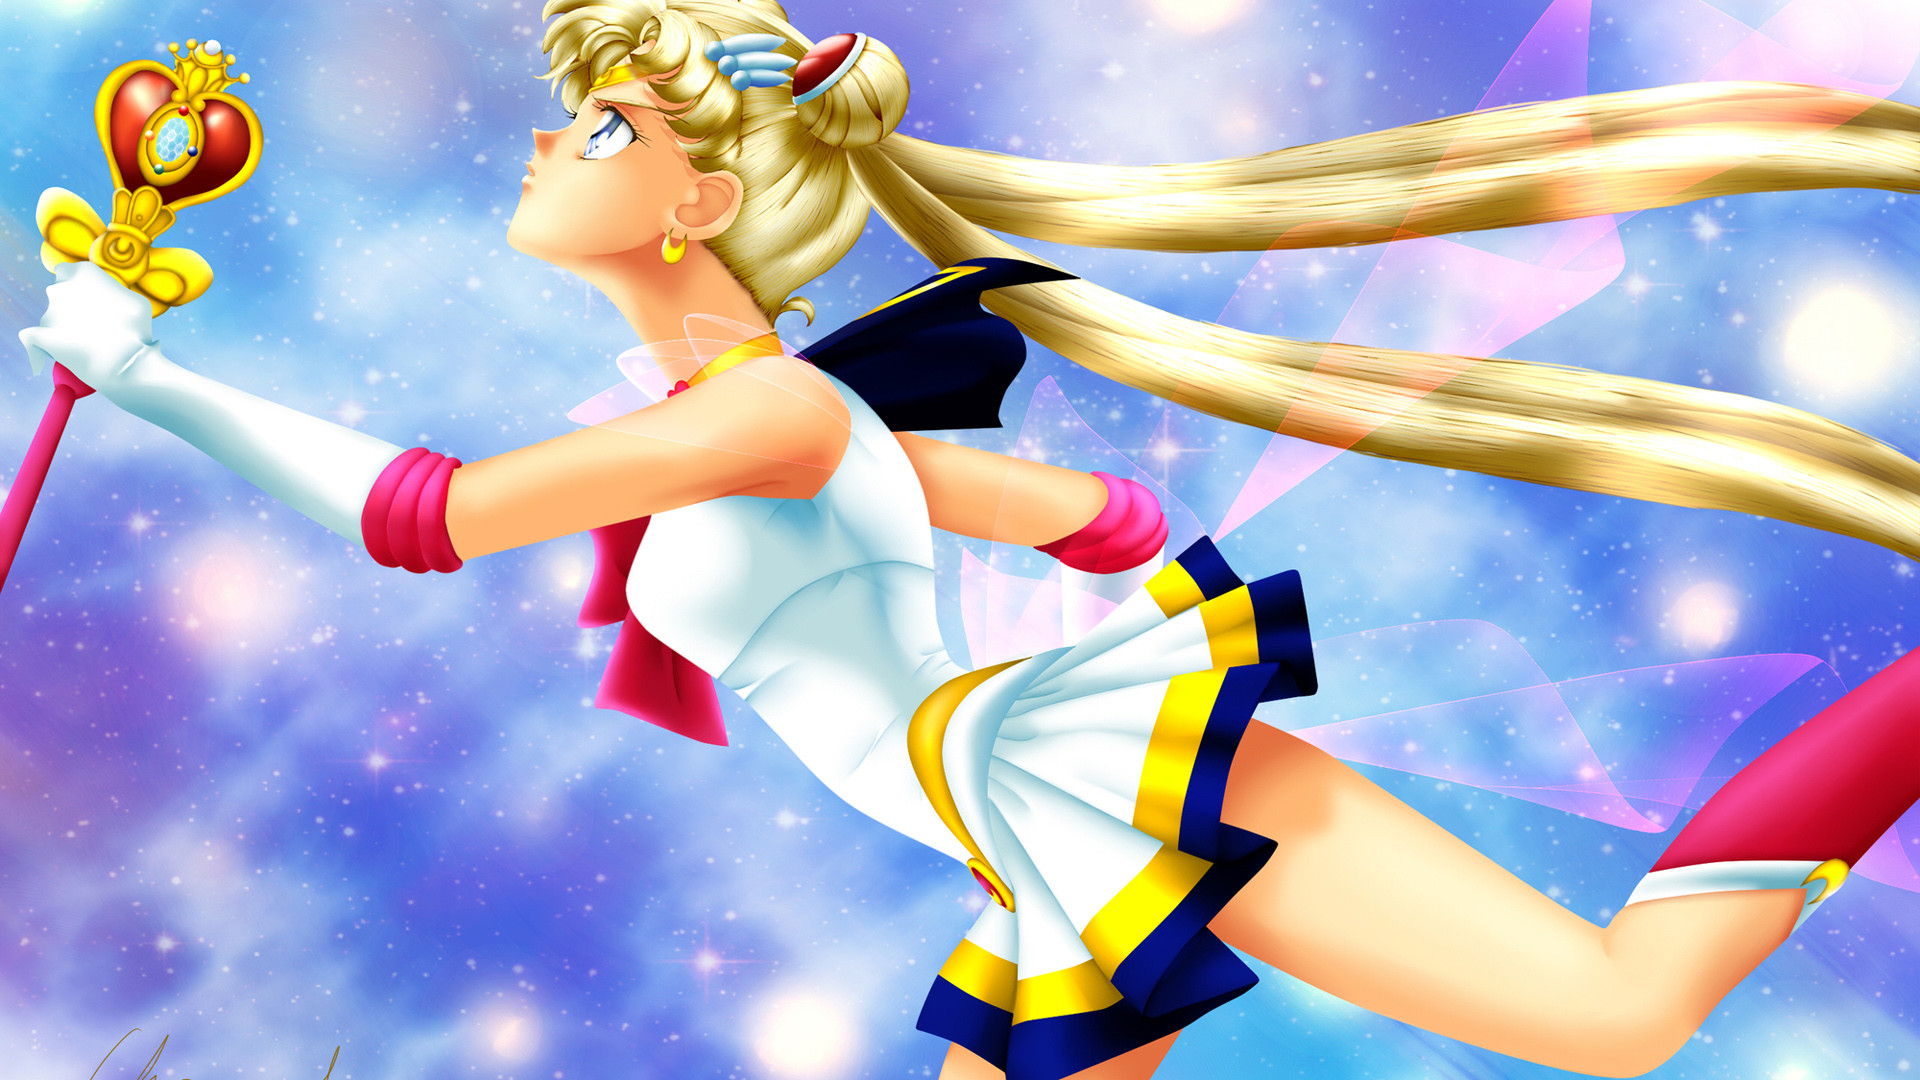 Tags: Sailor Moon …